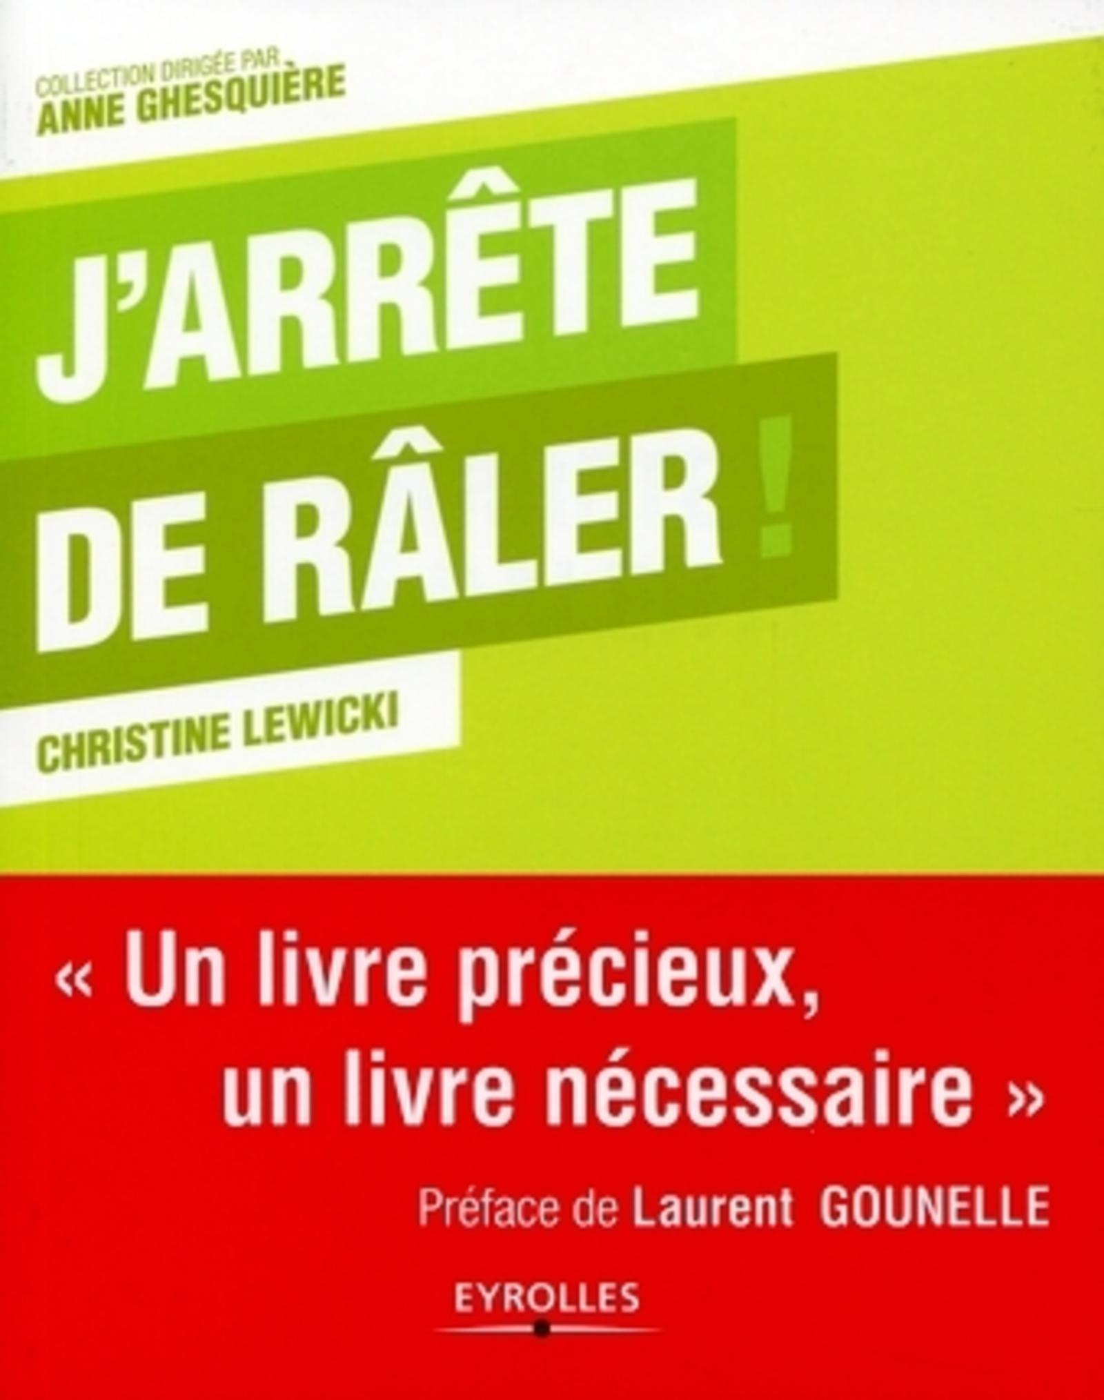 J ARRETE DE RALER